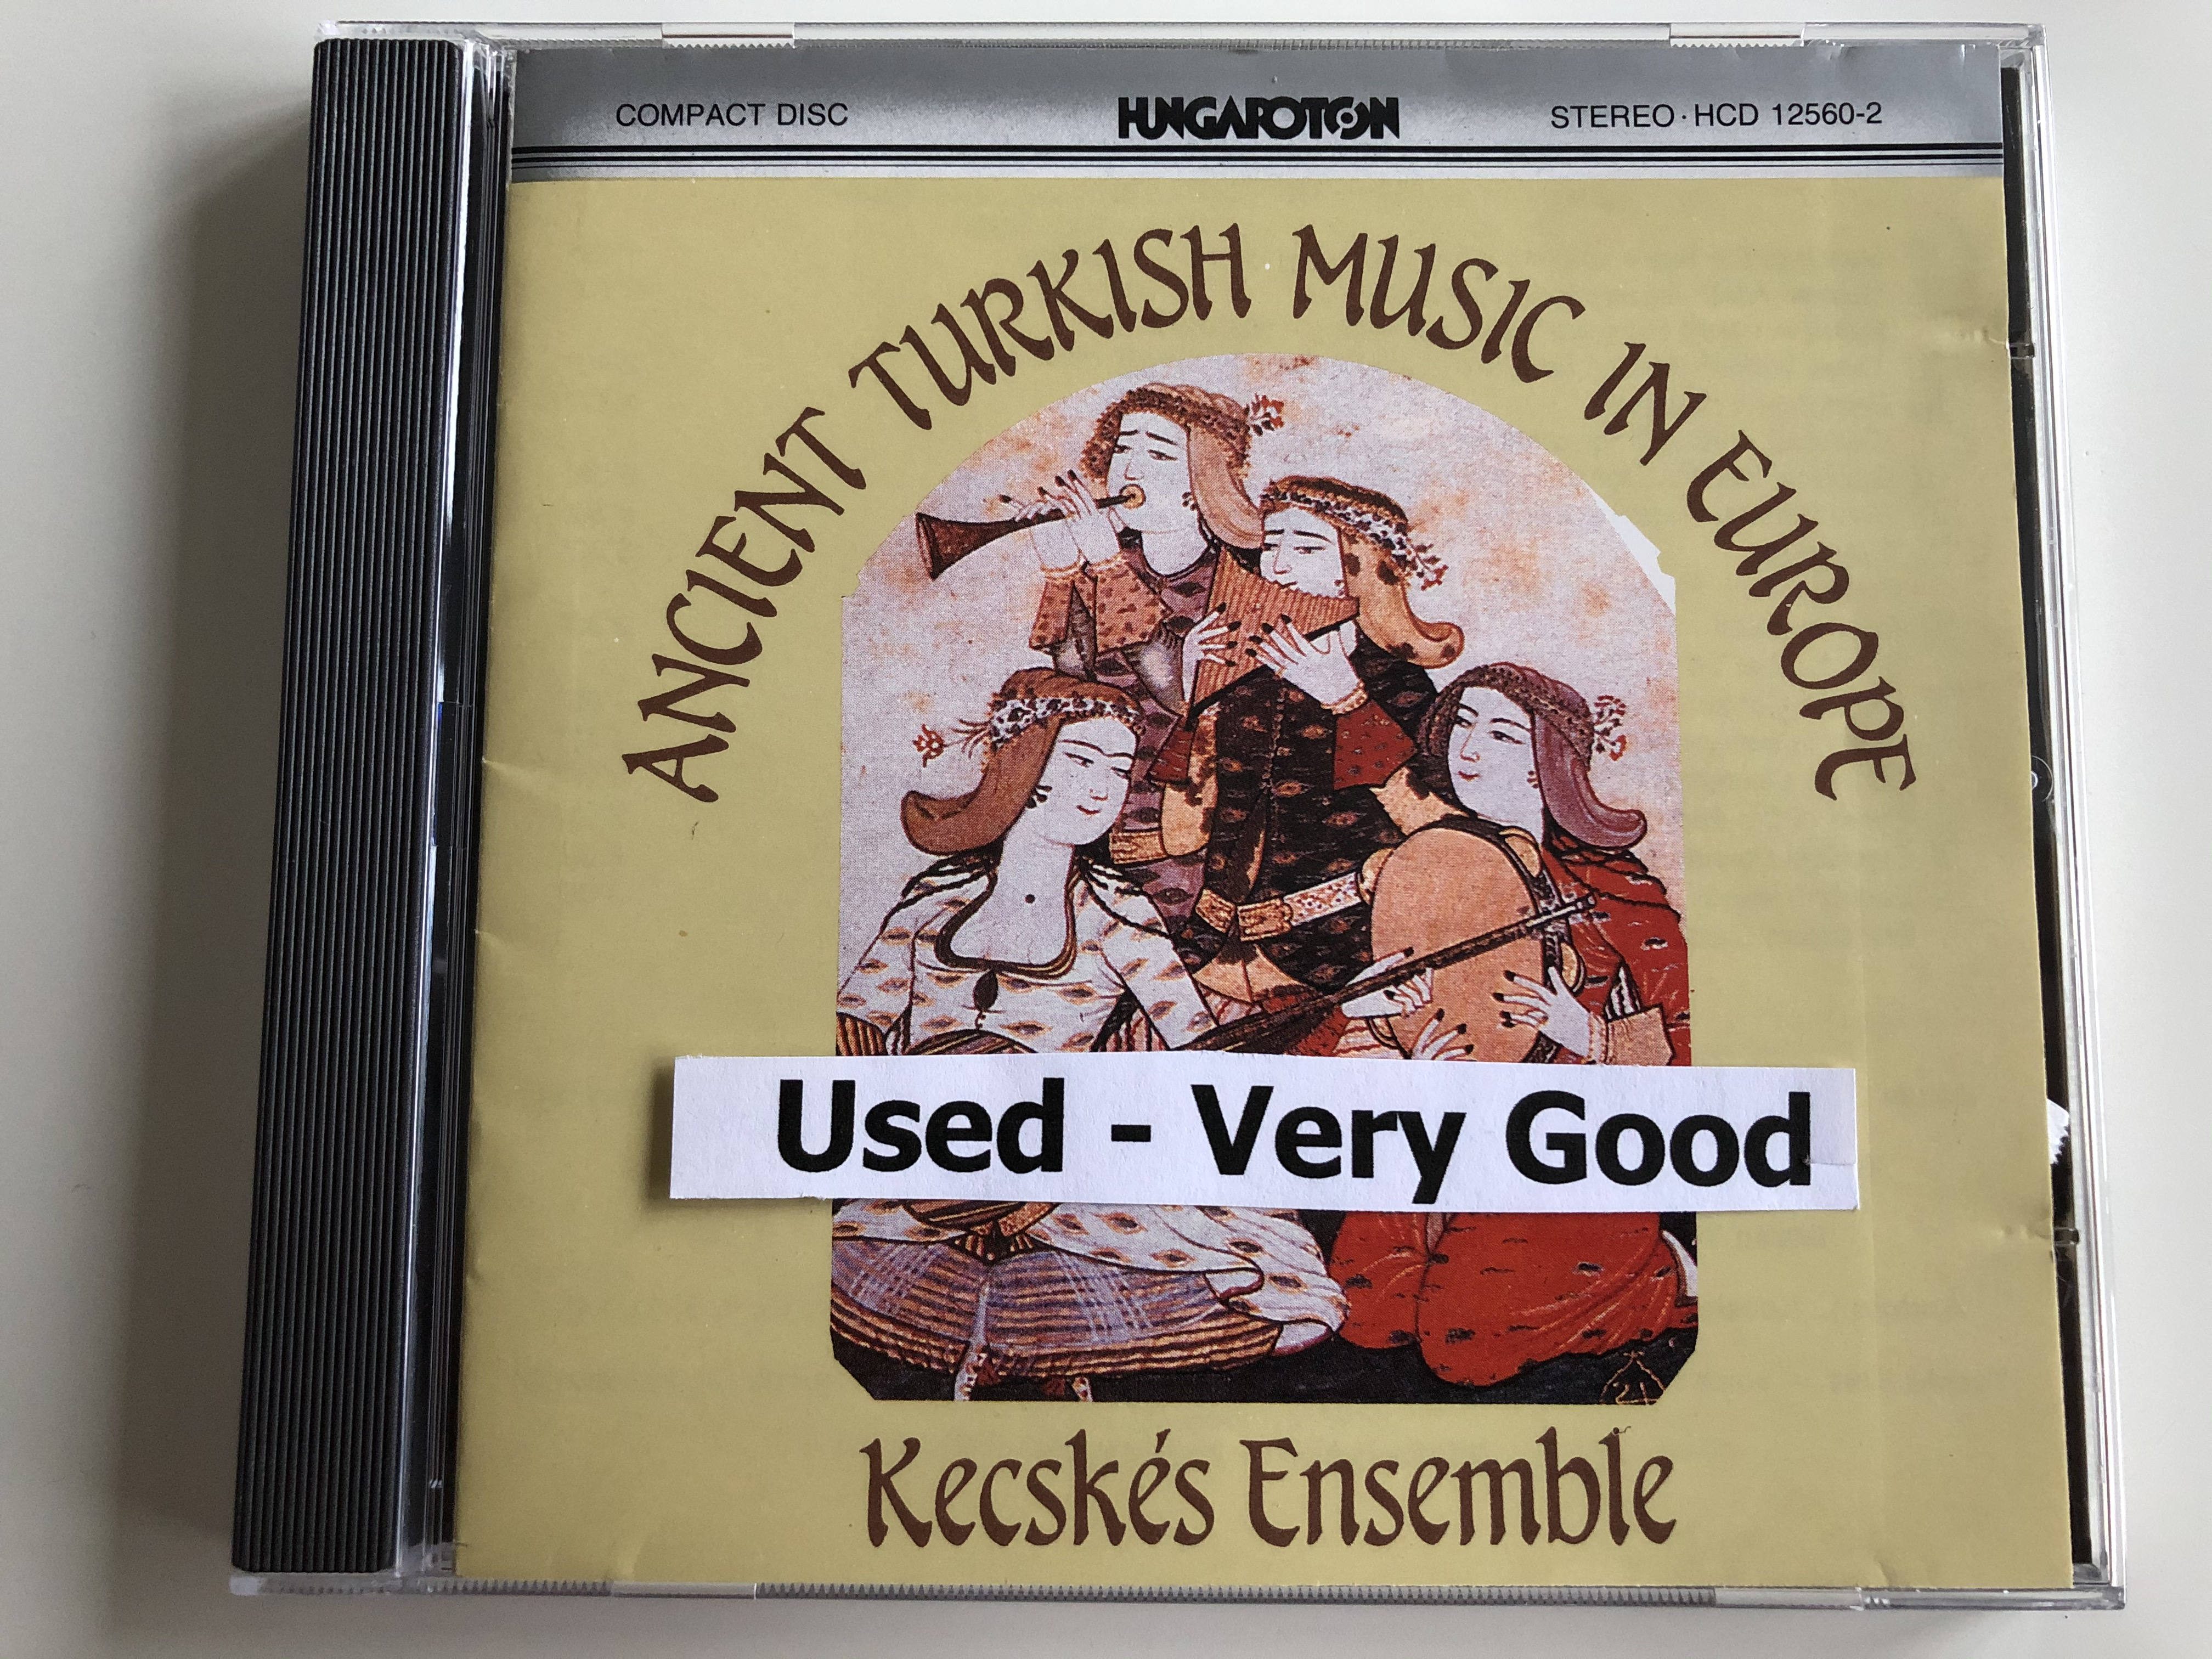 ancient-turkish-music-in-europe-kecsk-s-ensemble-hungaroton-audio-cd-1984-stereo-hcd-12560-2-1-.jpg